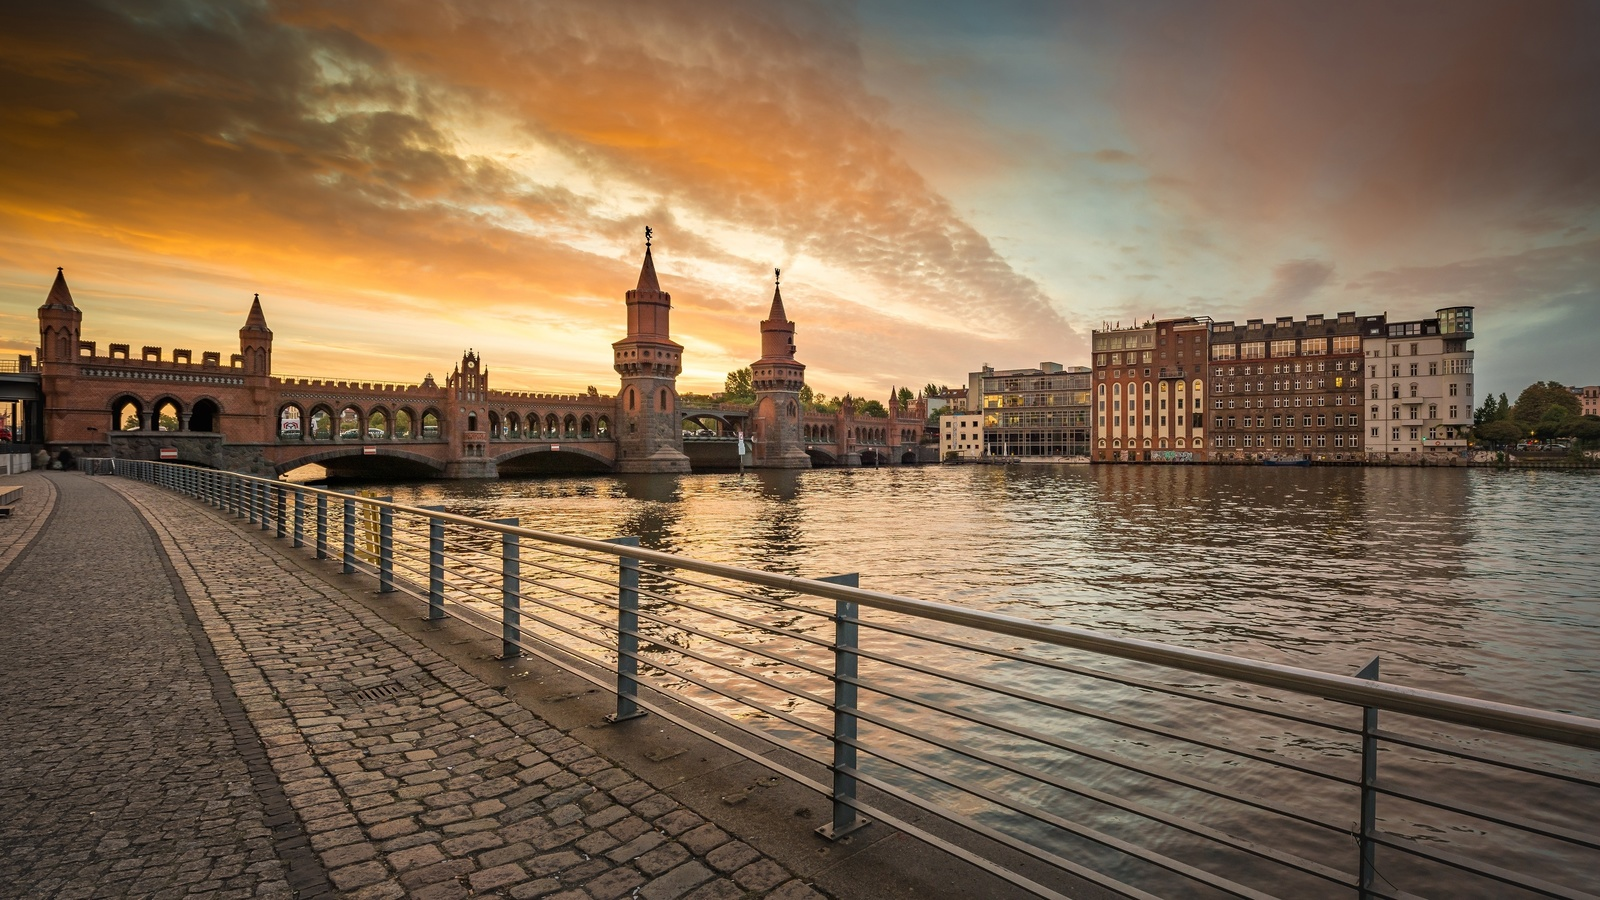 германия, берлин, набережная, река, мост, закат